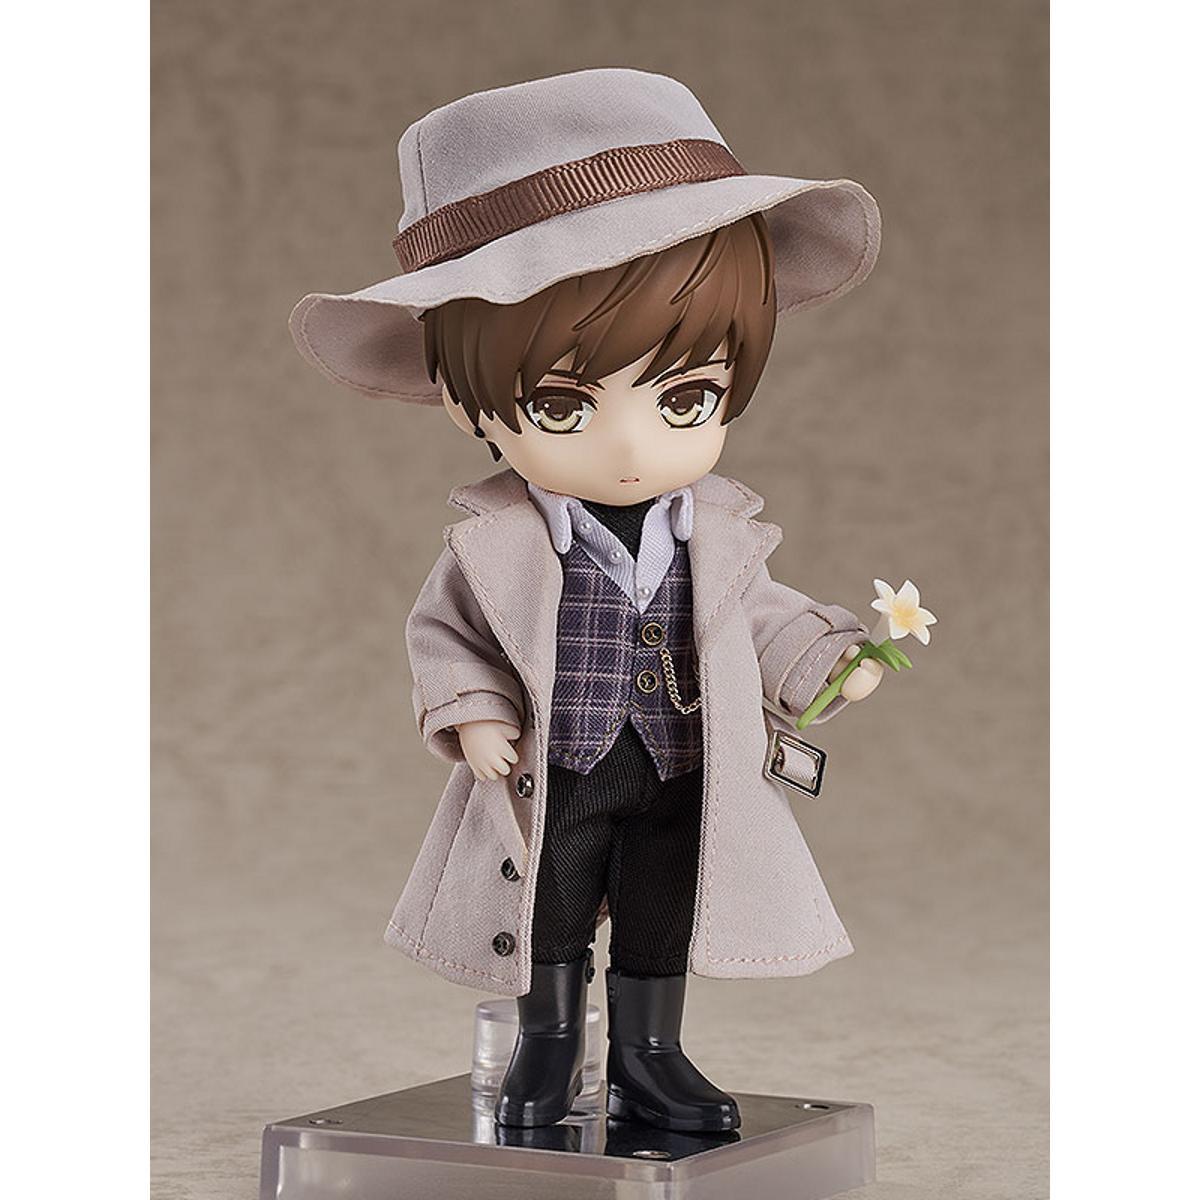 Nendoroid Doll Bai Qi: Min Guo Ver.